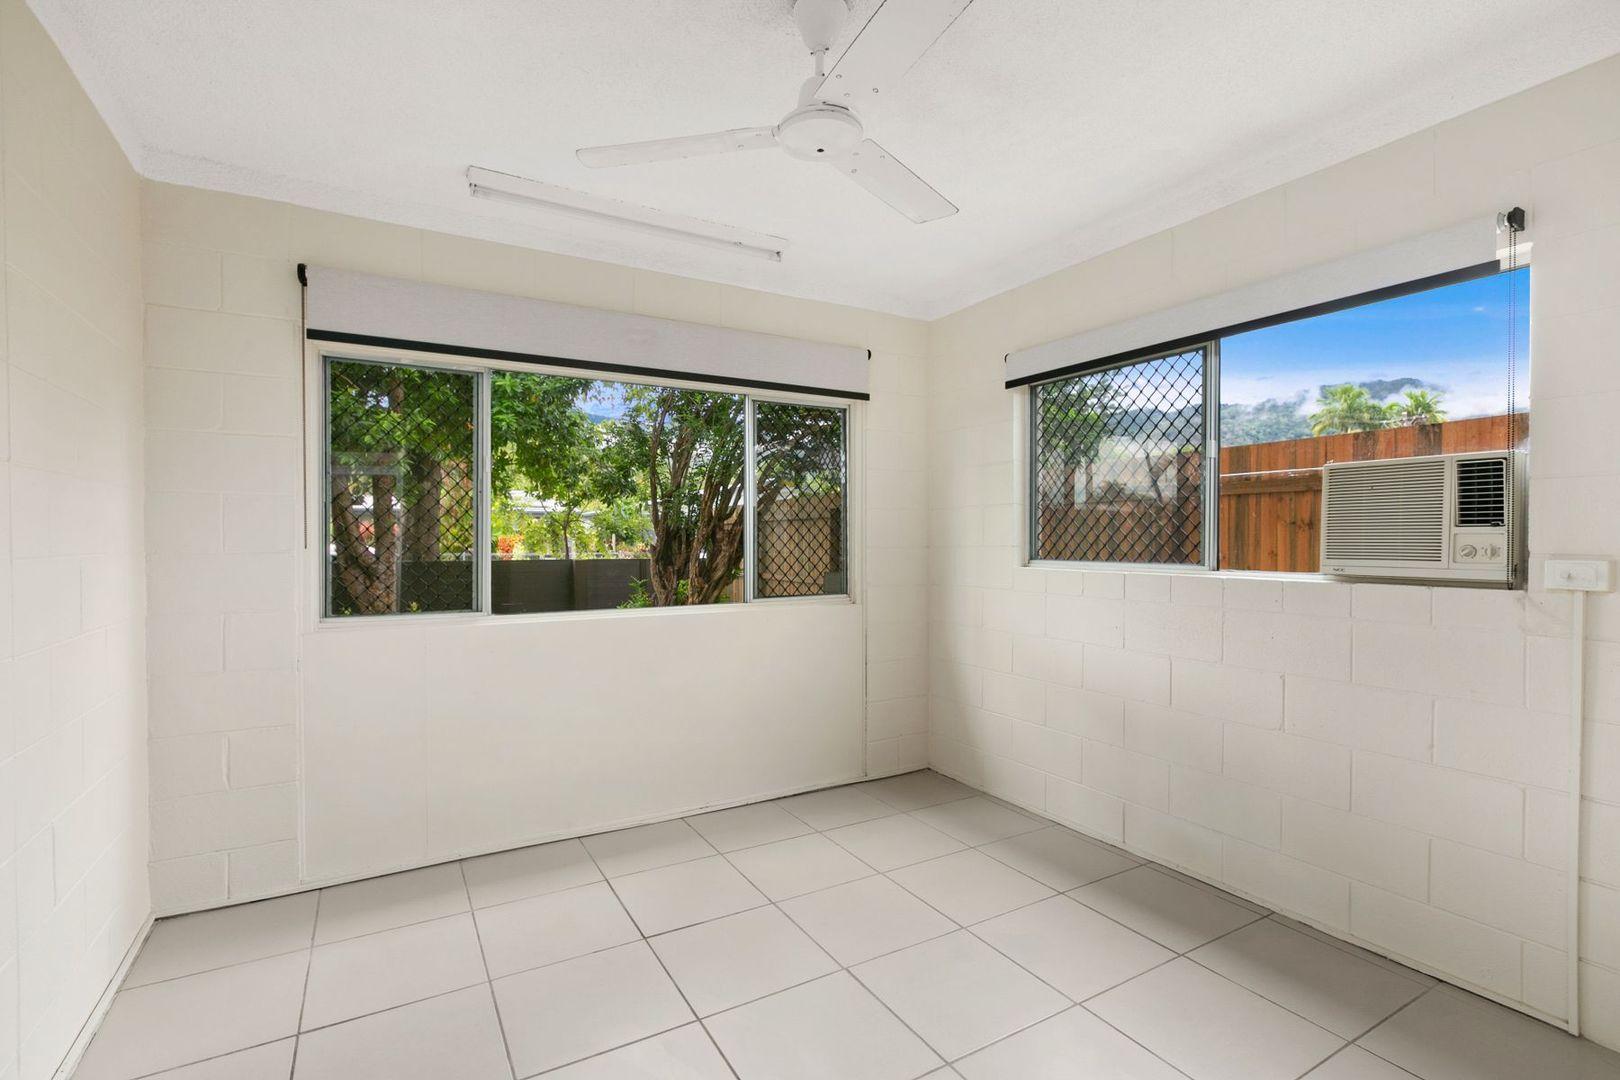 1/9 Sondrio Street, Woree QLD 4868, Image 2